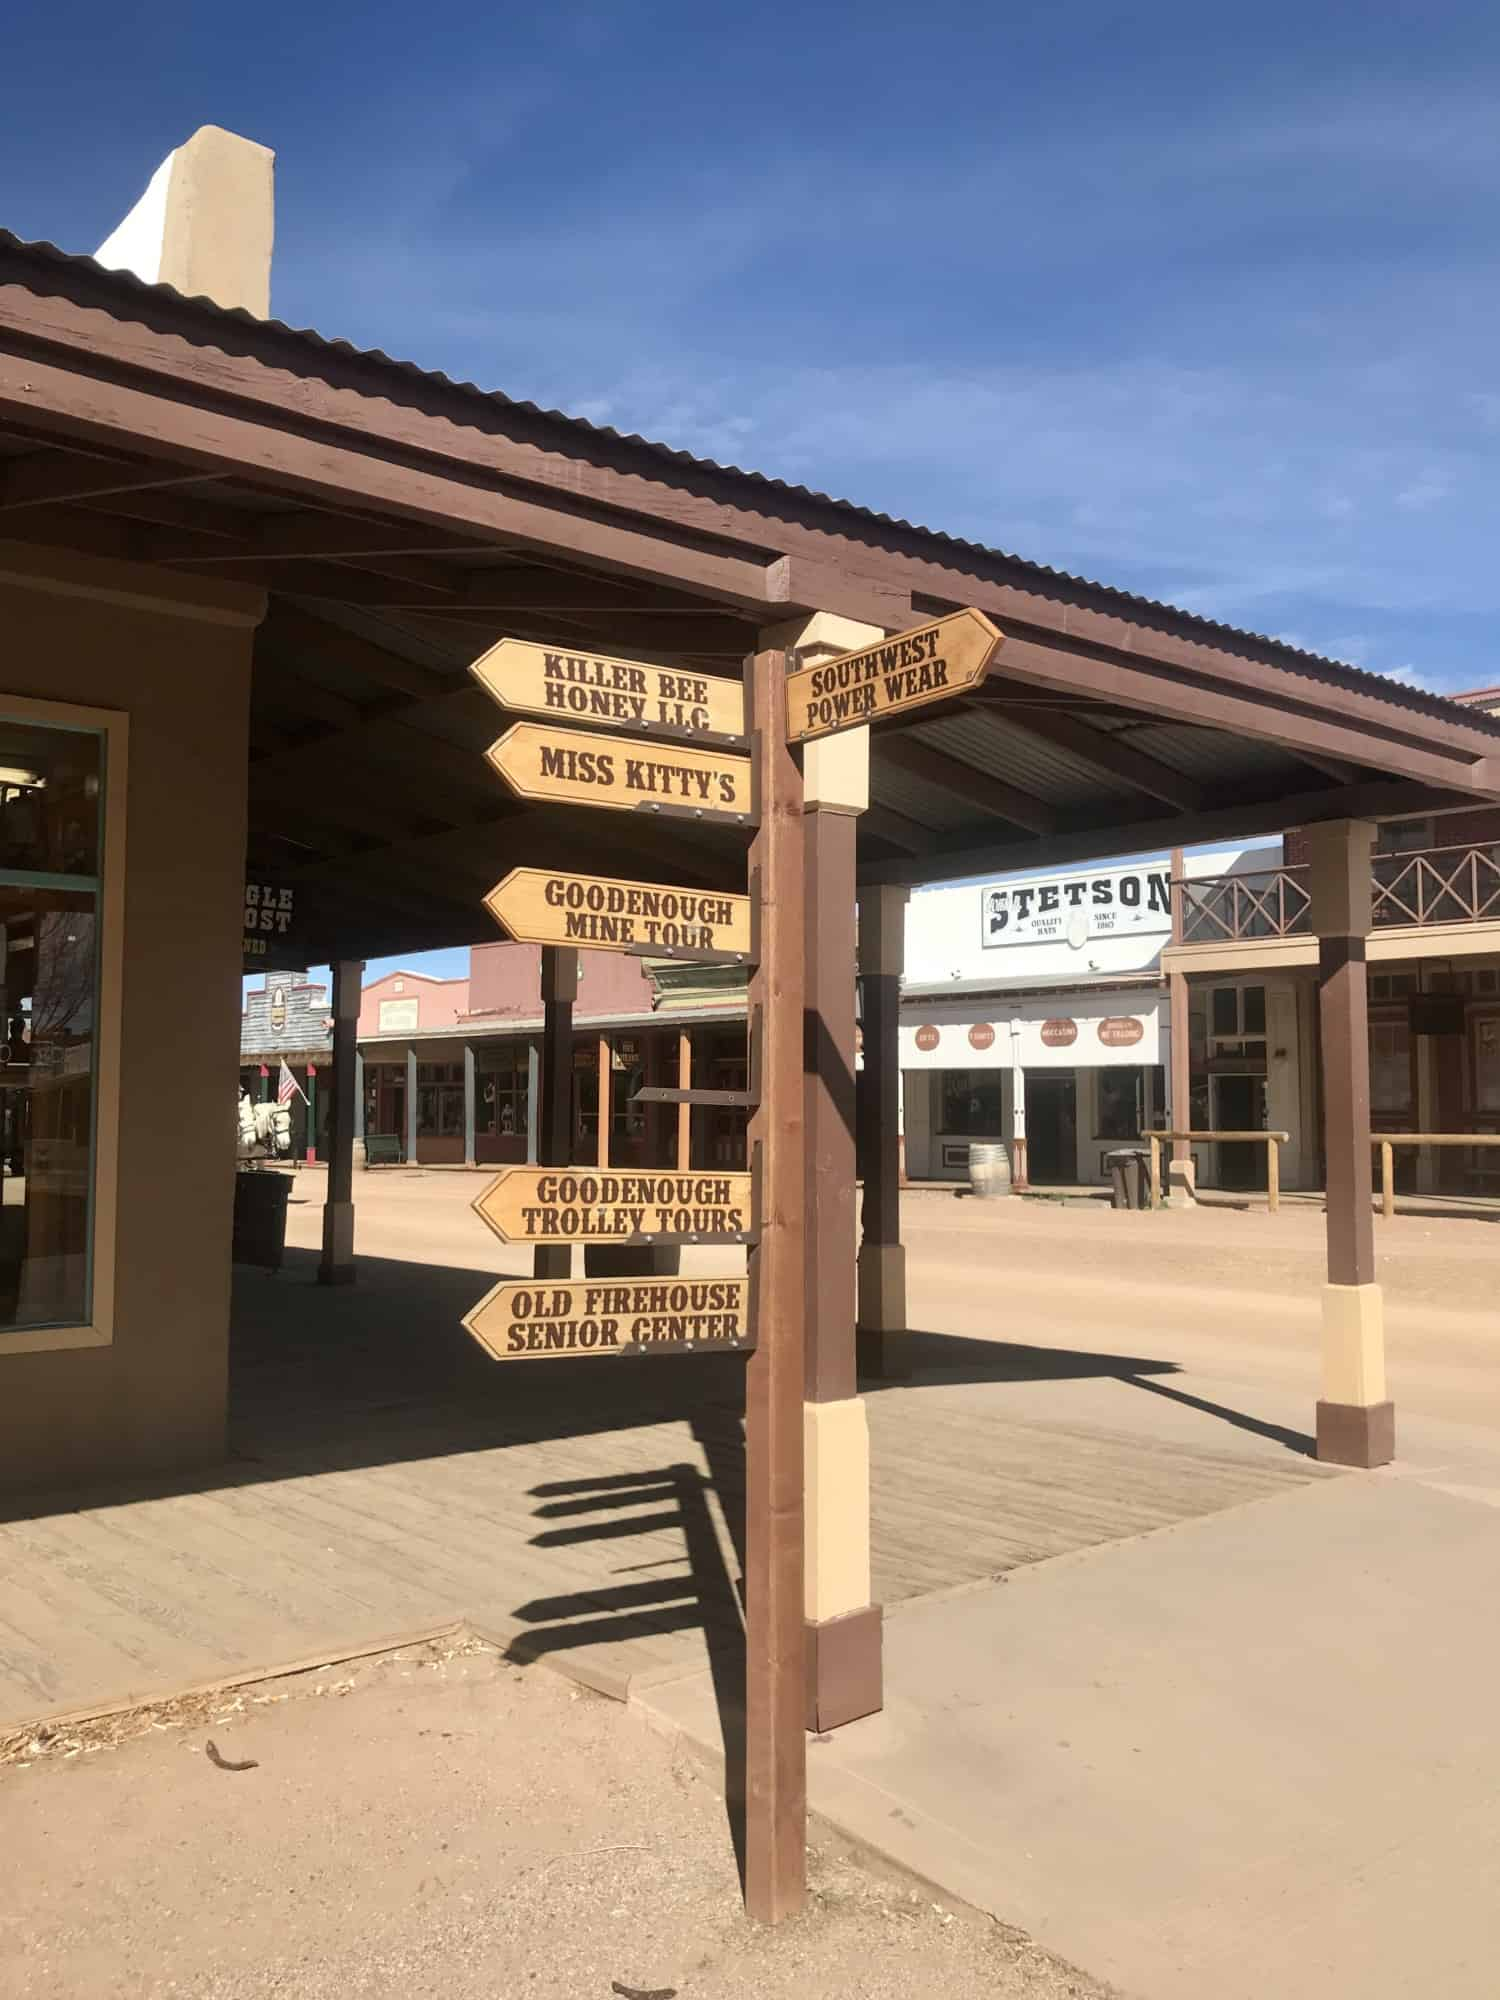 Street sign in Tombstone, AZ